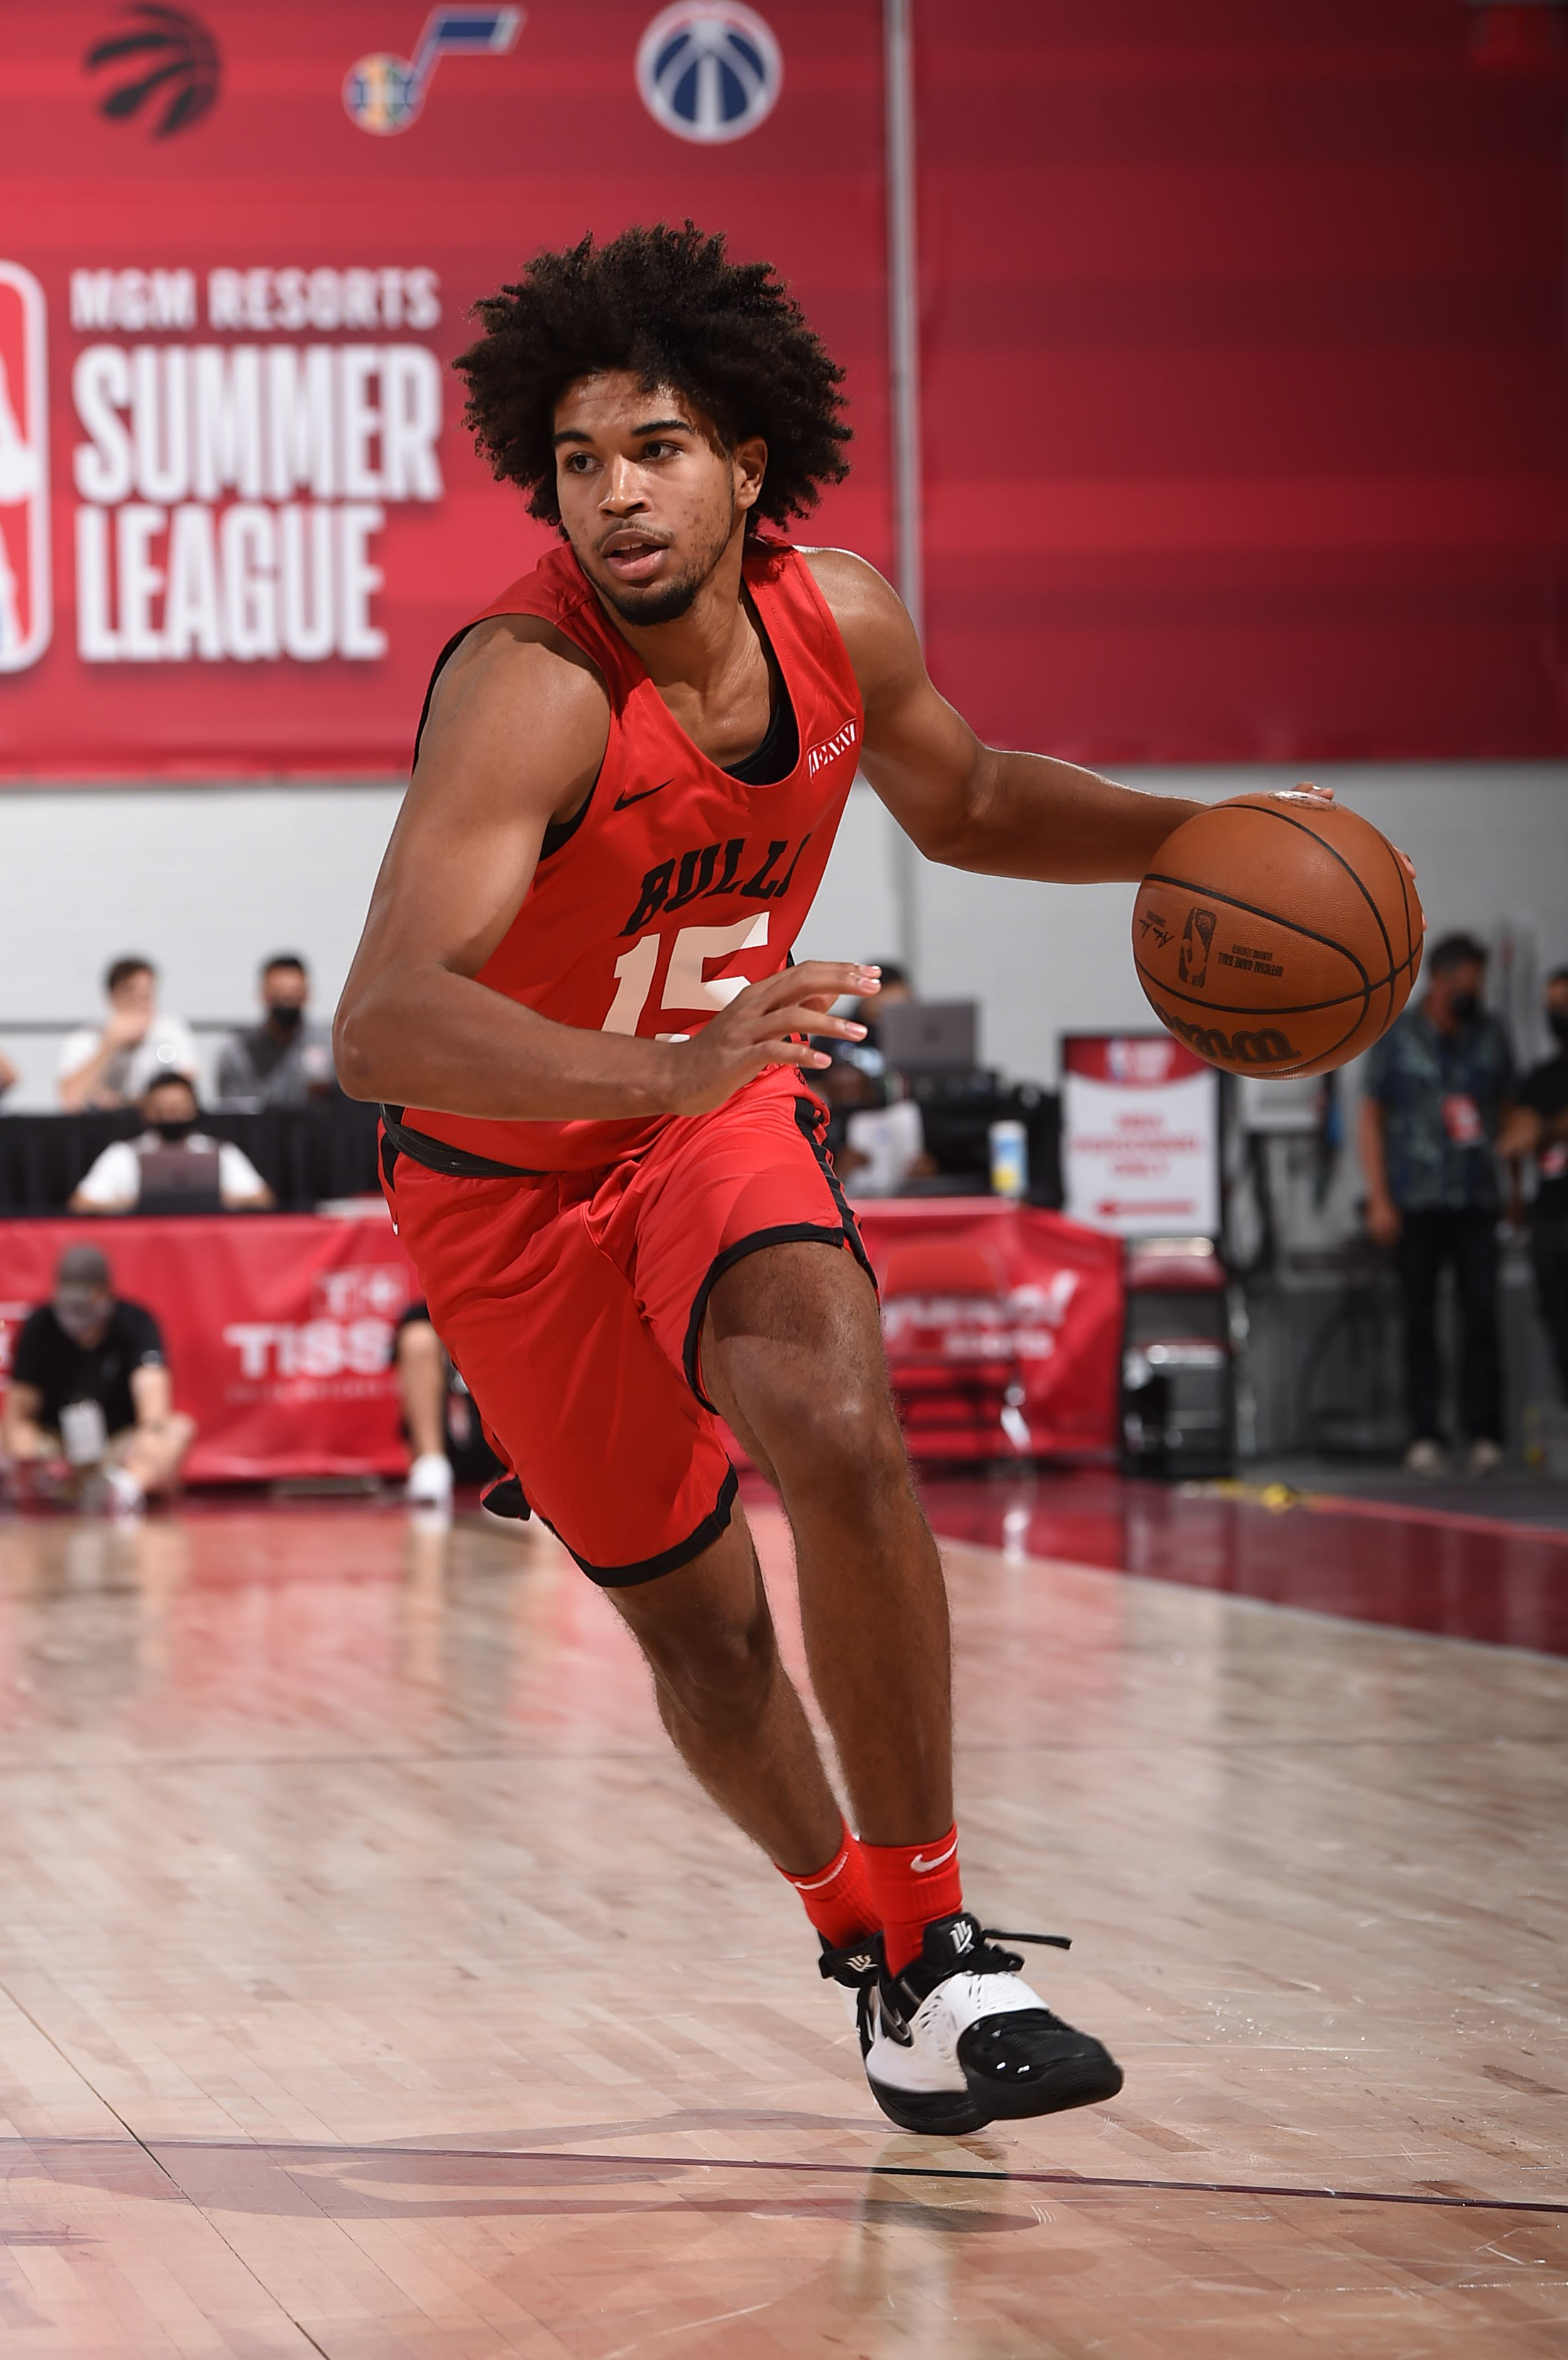 2021 Las Vegas Summer League - Chicago Bulls v San Antonio Spurs